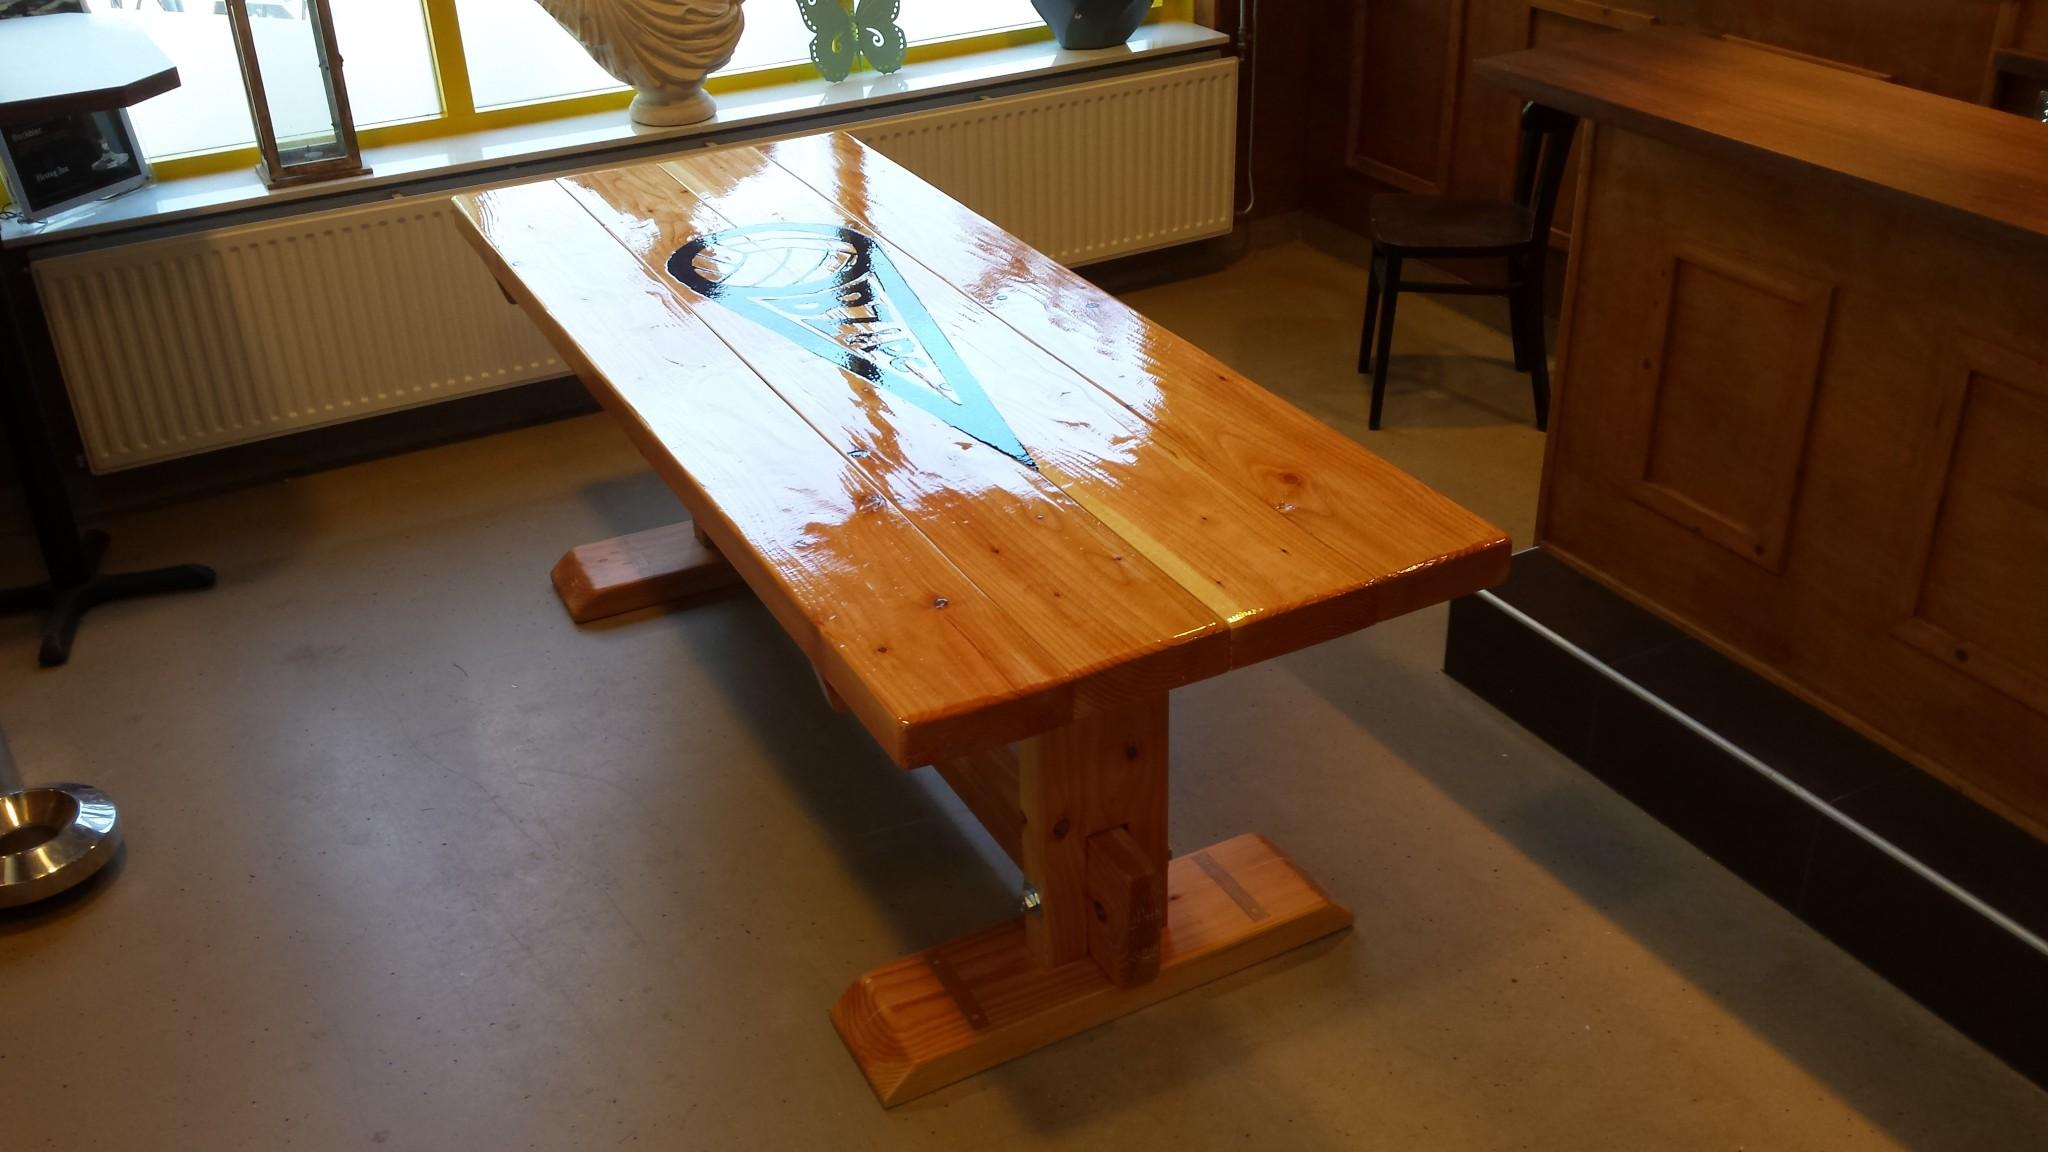 Tafel Laten Maken : Steigerhouten meubel laten maken ikmaakhetzelfwel